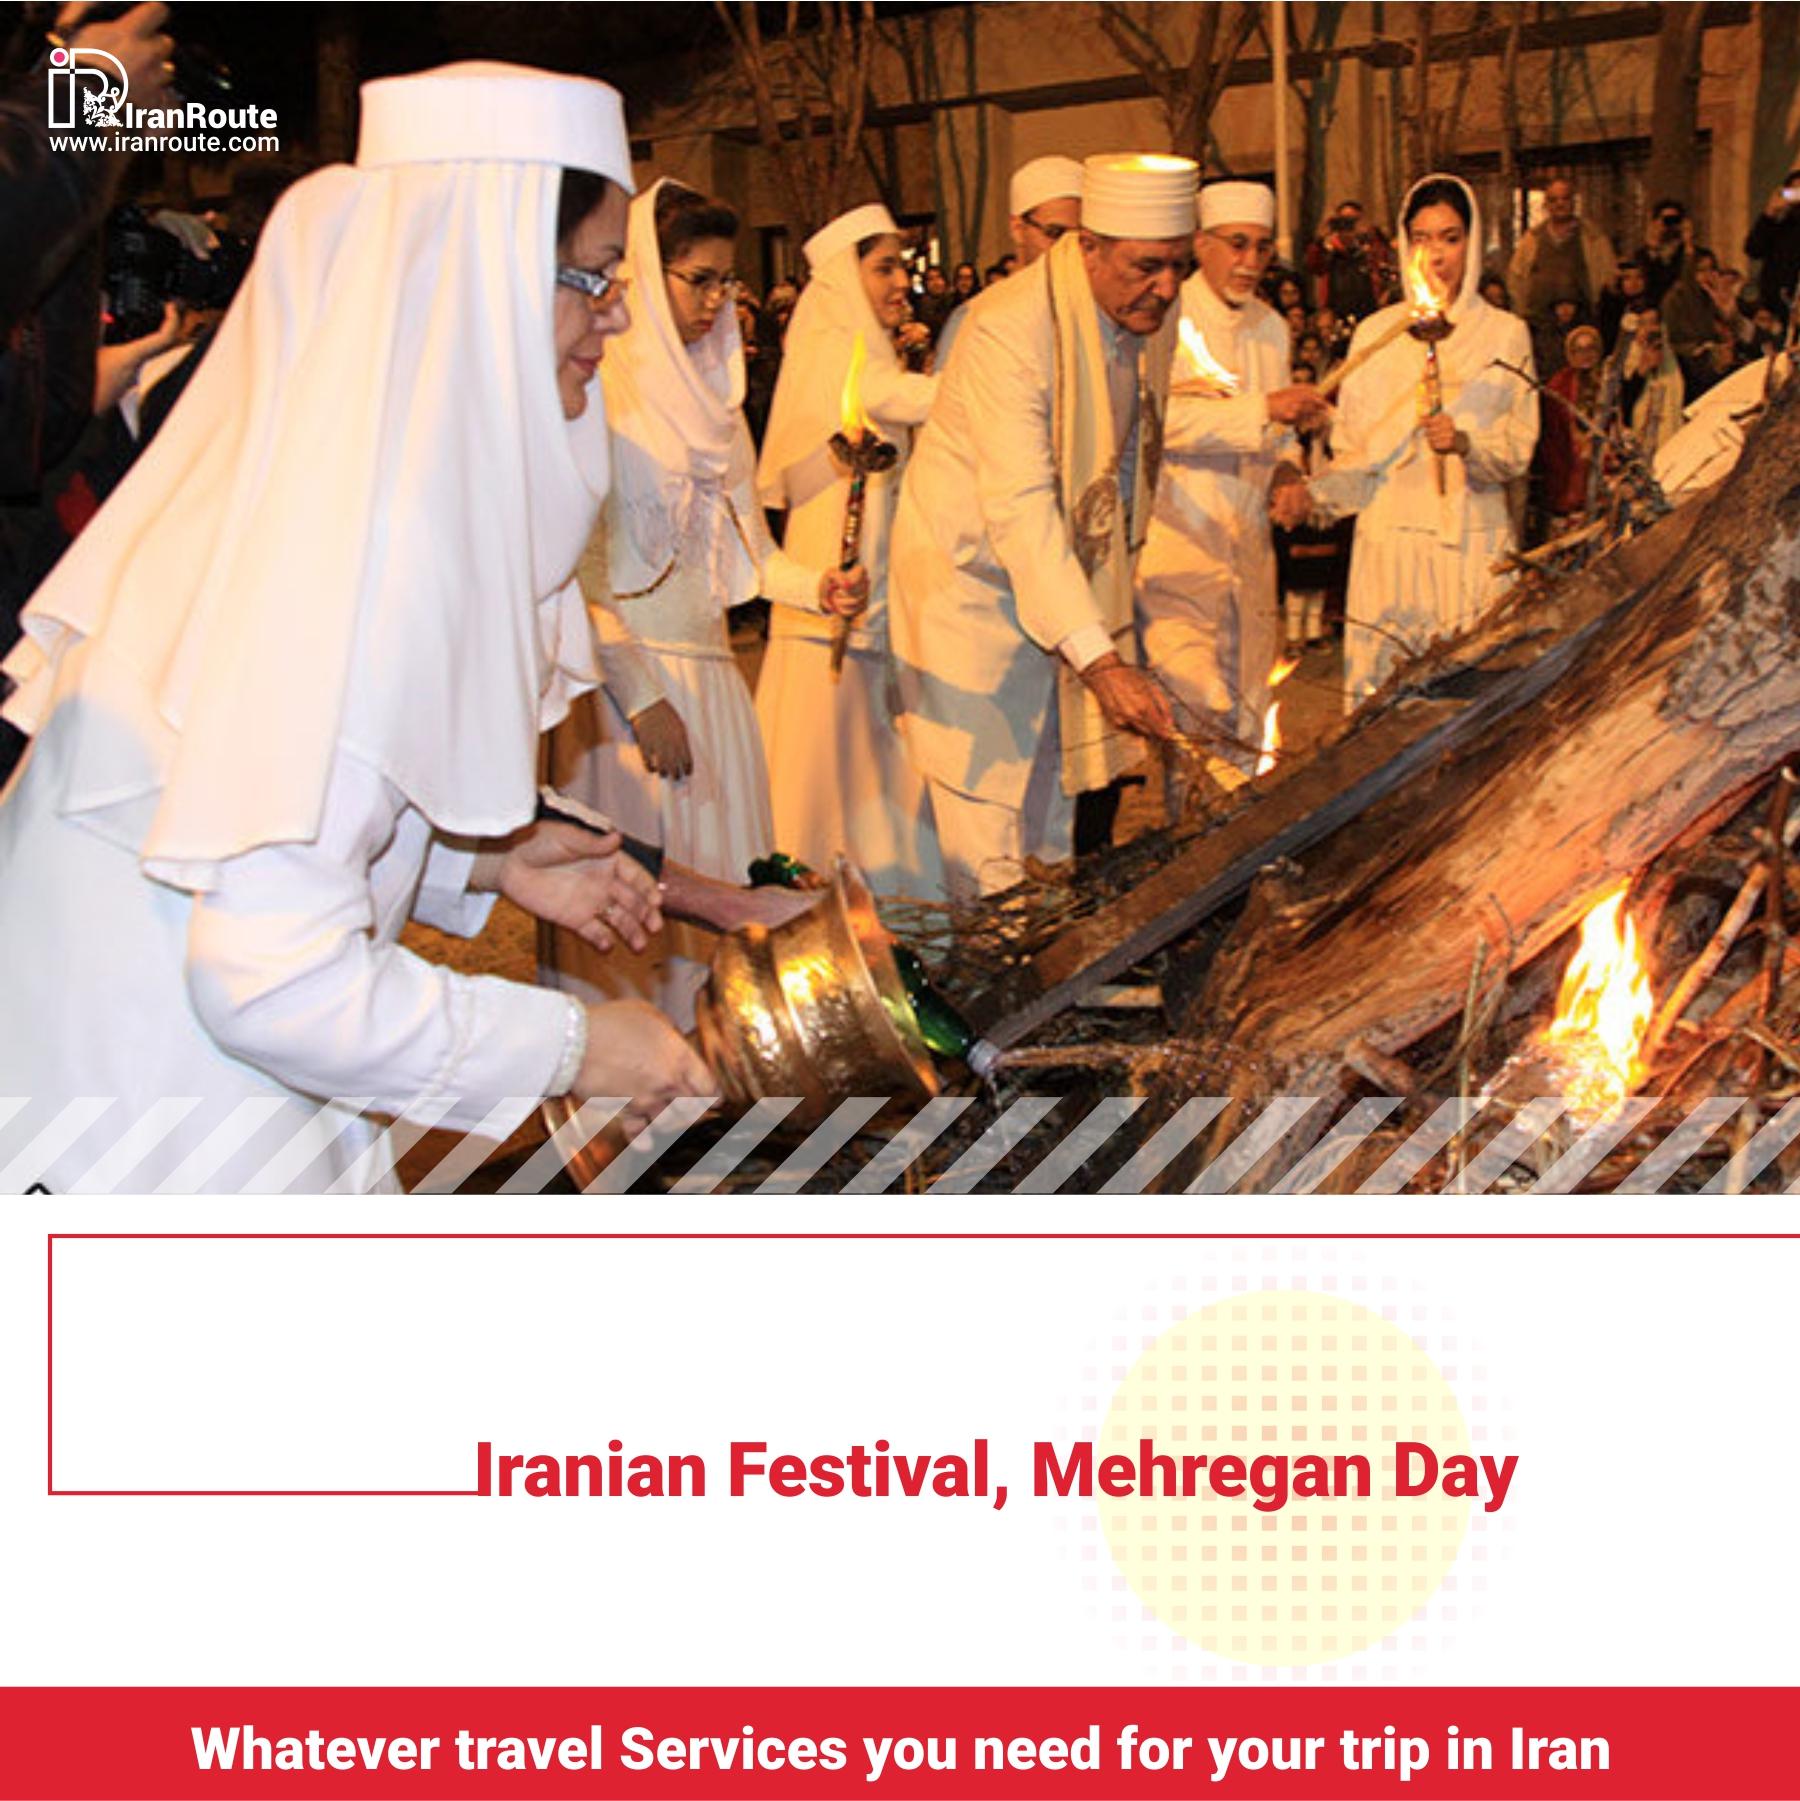 Mehregan: The Autumn Festival of Harvest from Ancient Persia